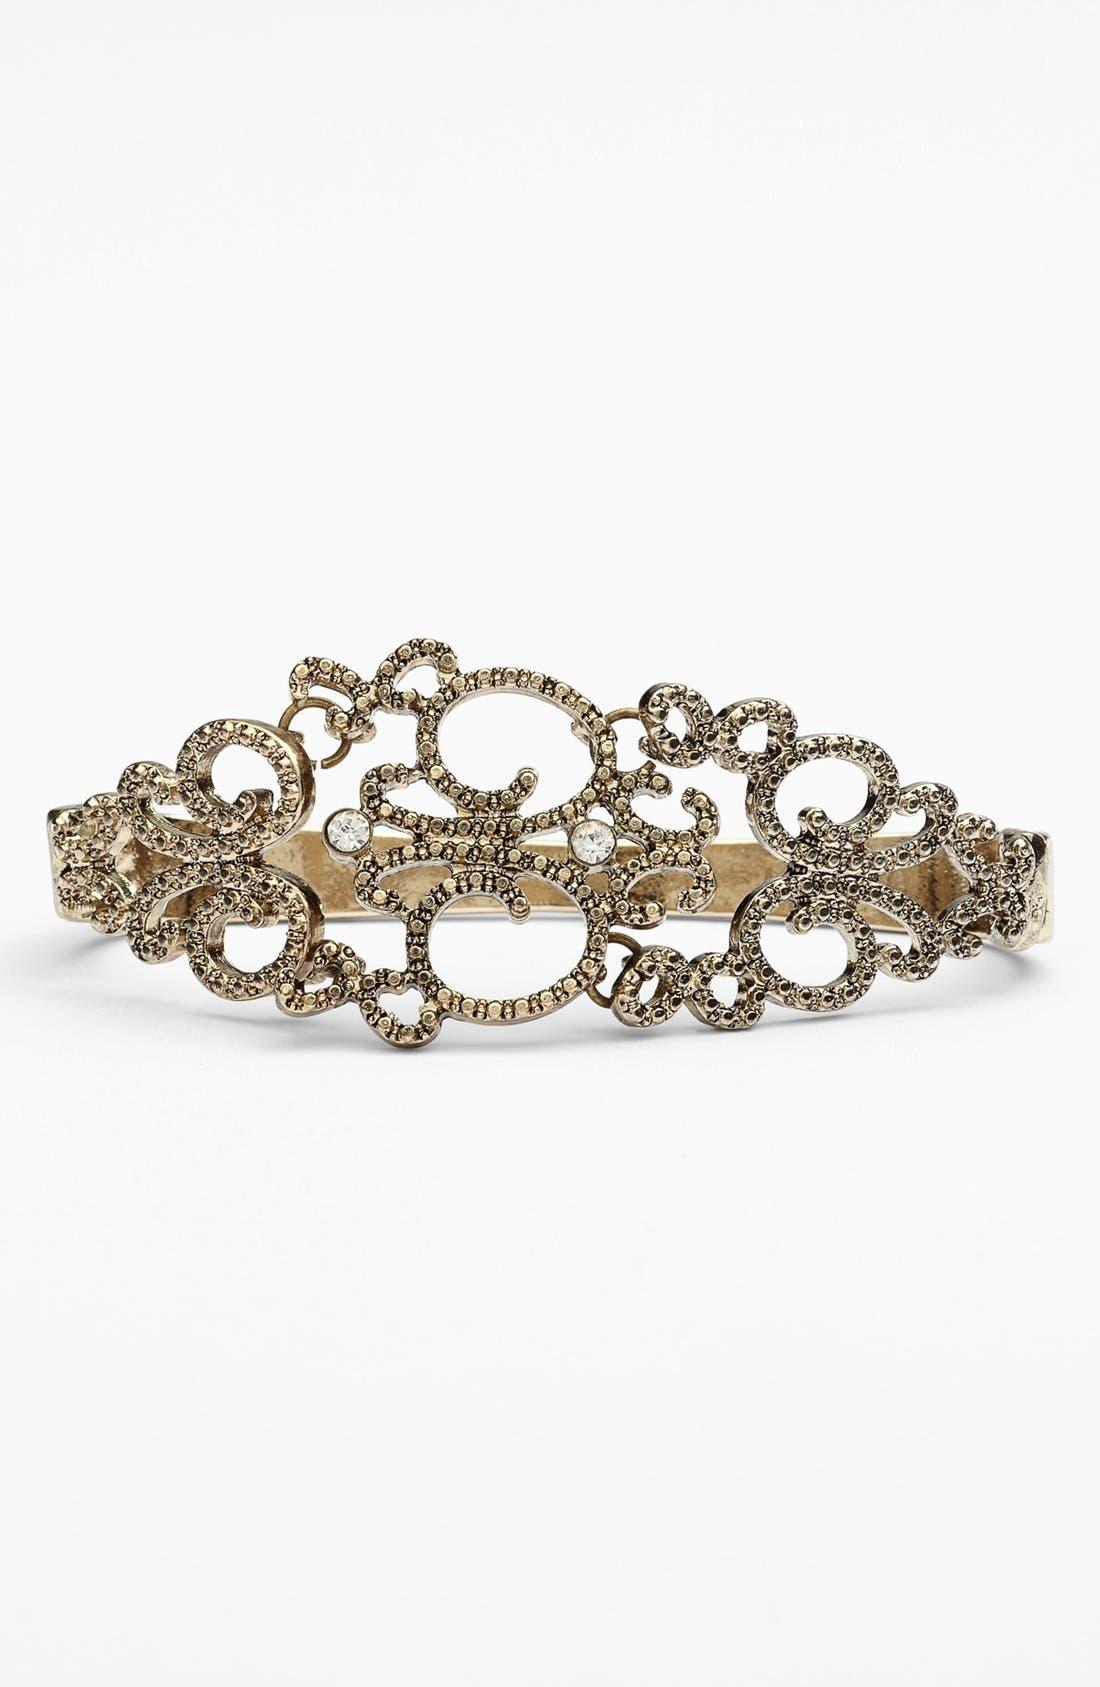 Alternate Image 1 Selected - Tildon 'Vintage' Hand Bracelet